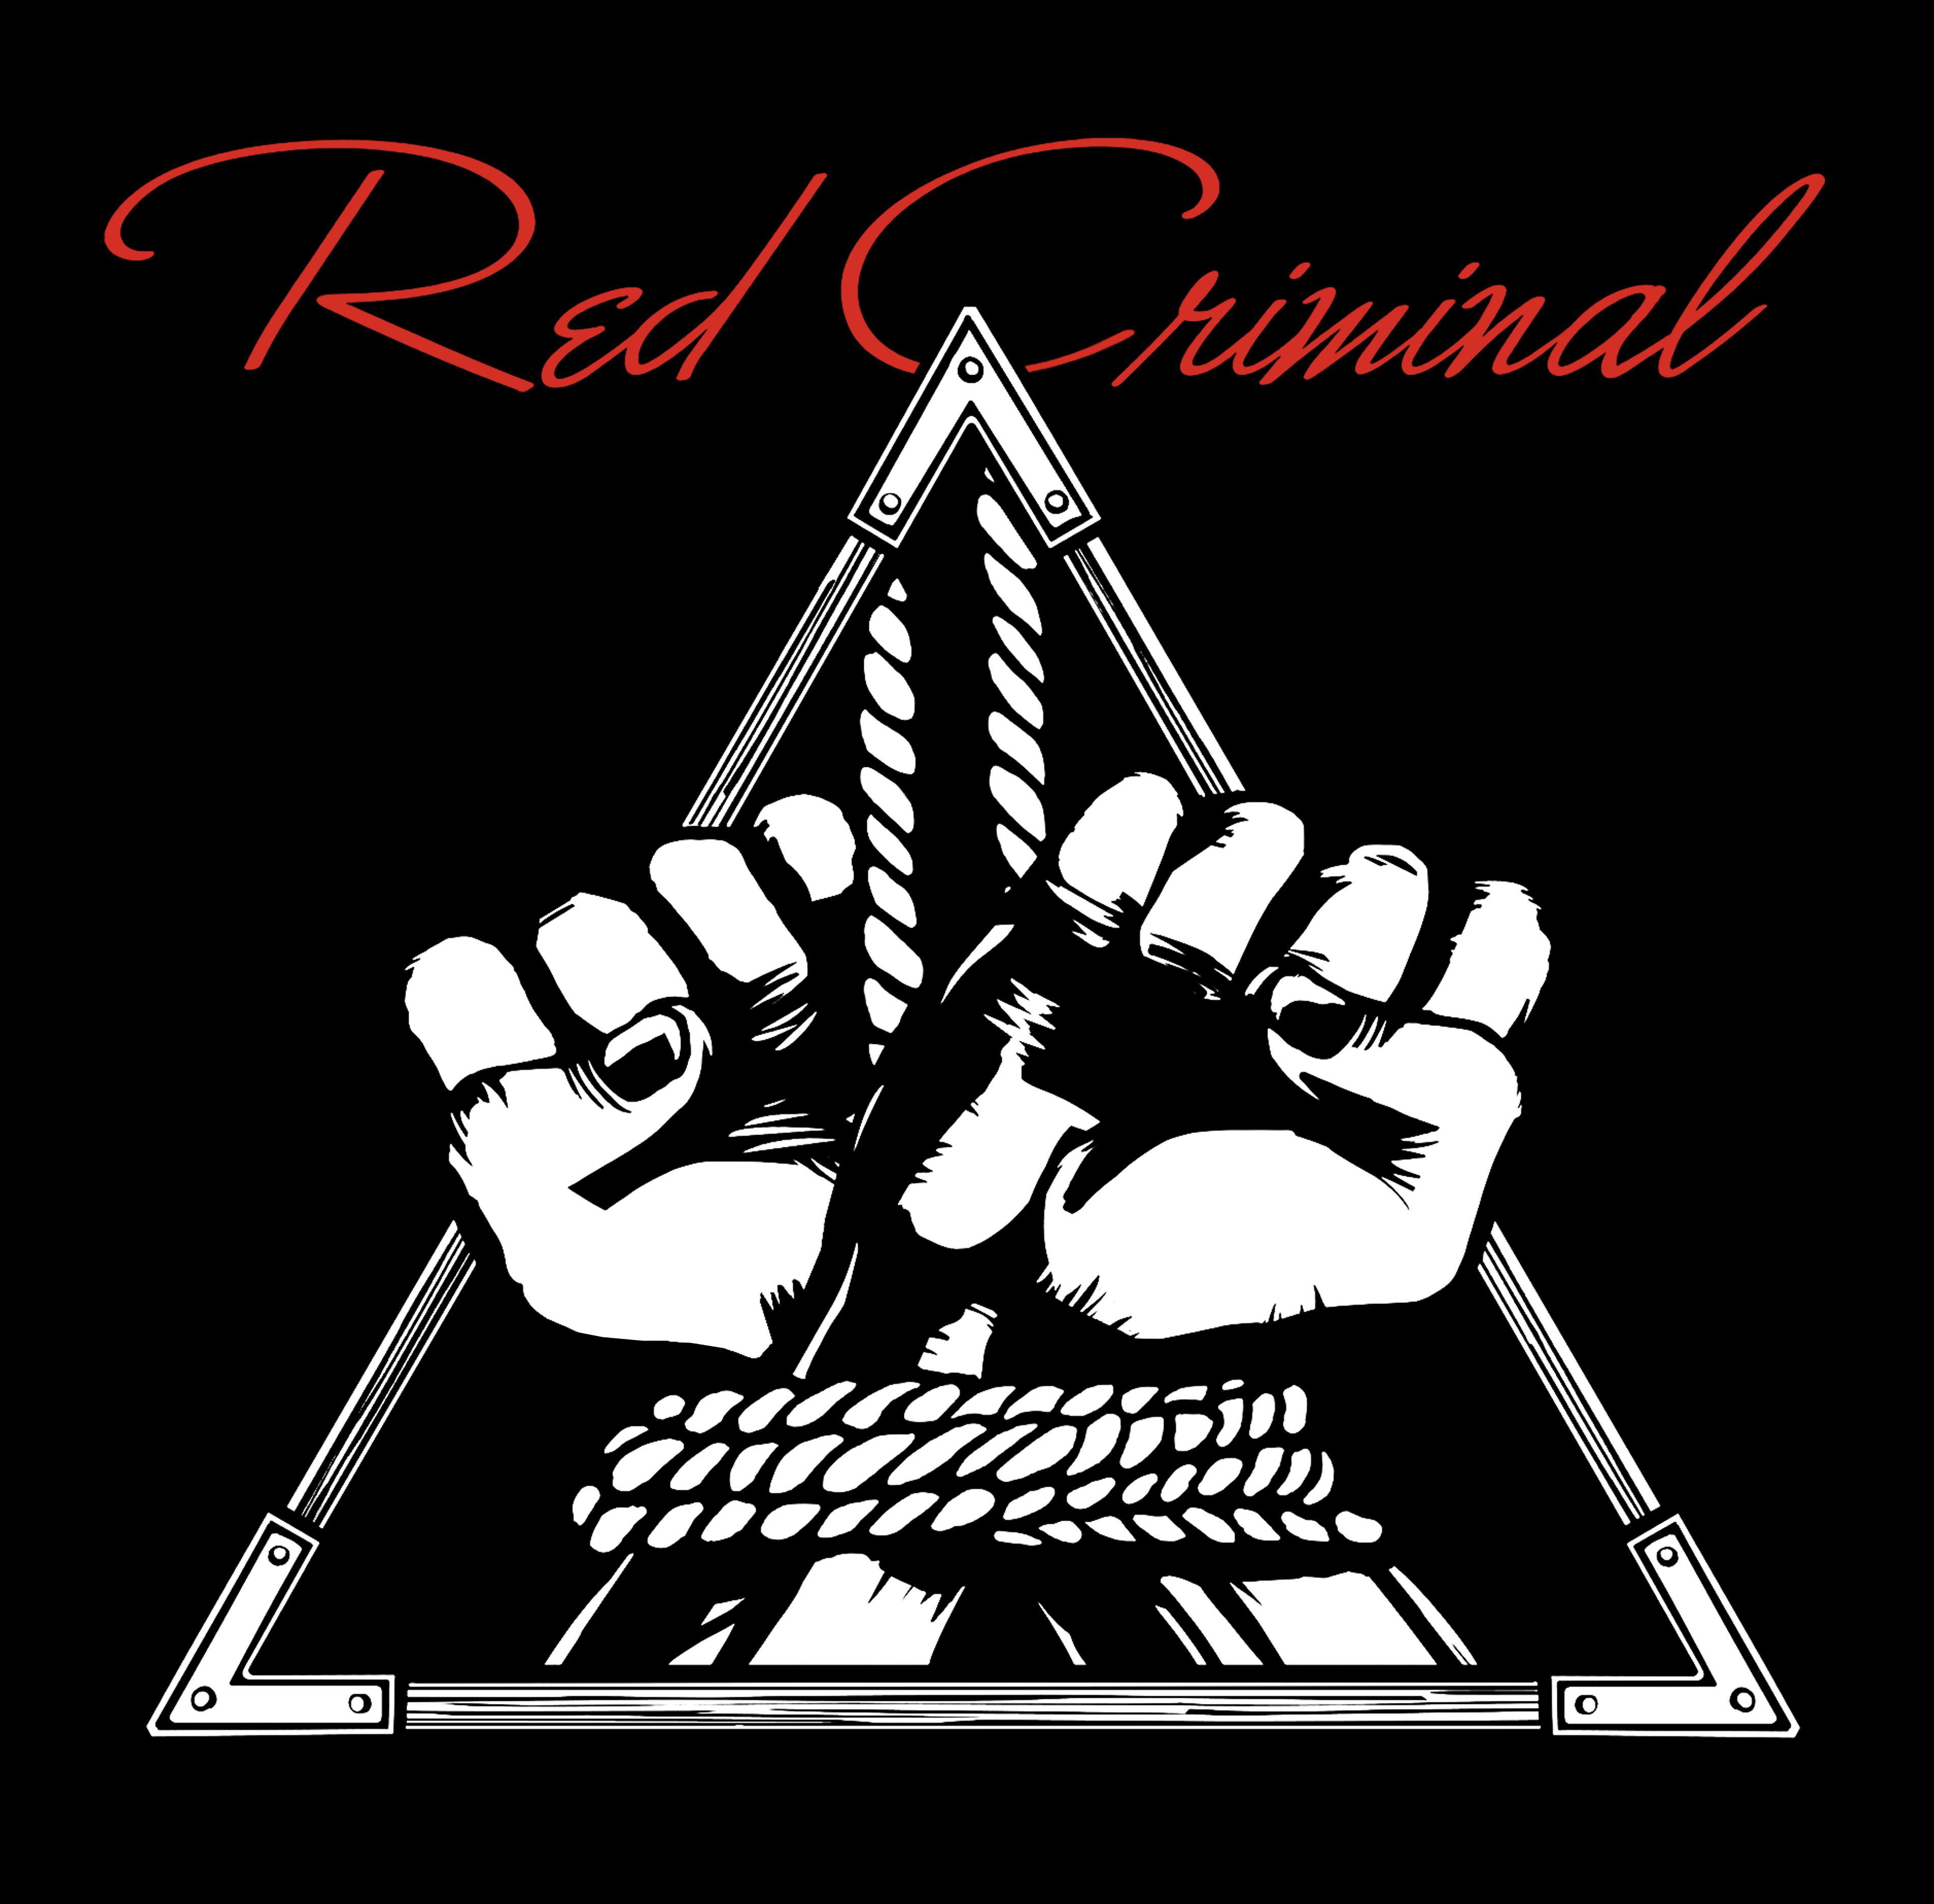 「Red Criminal」ジャケット